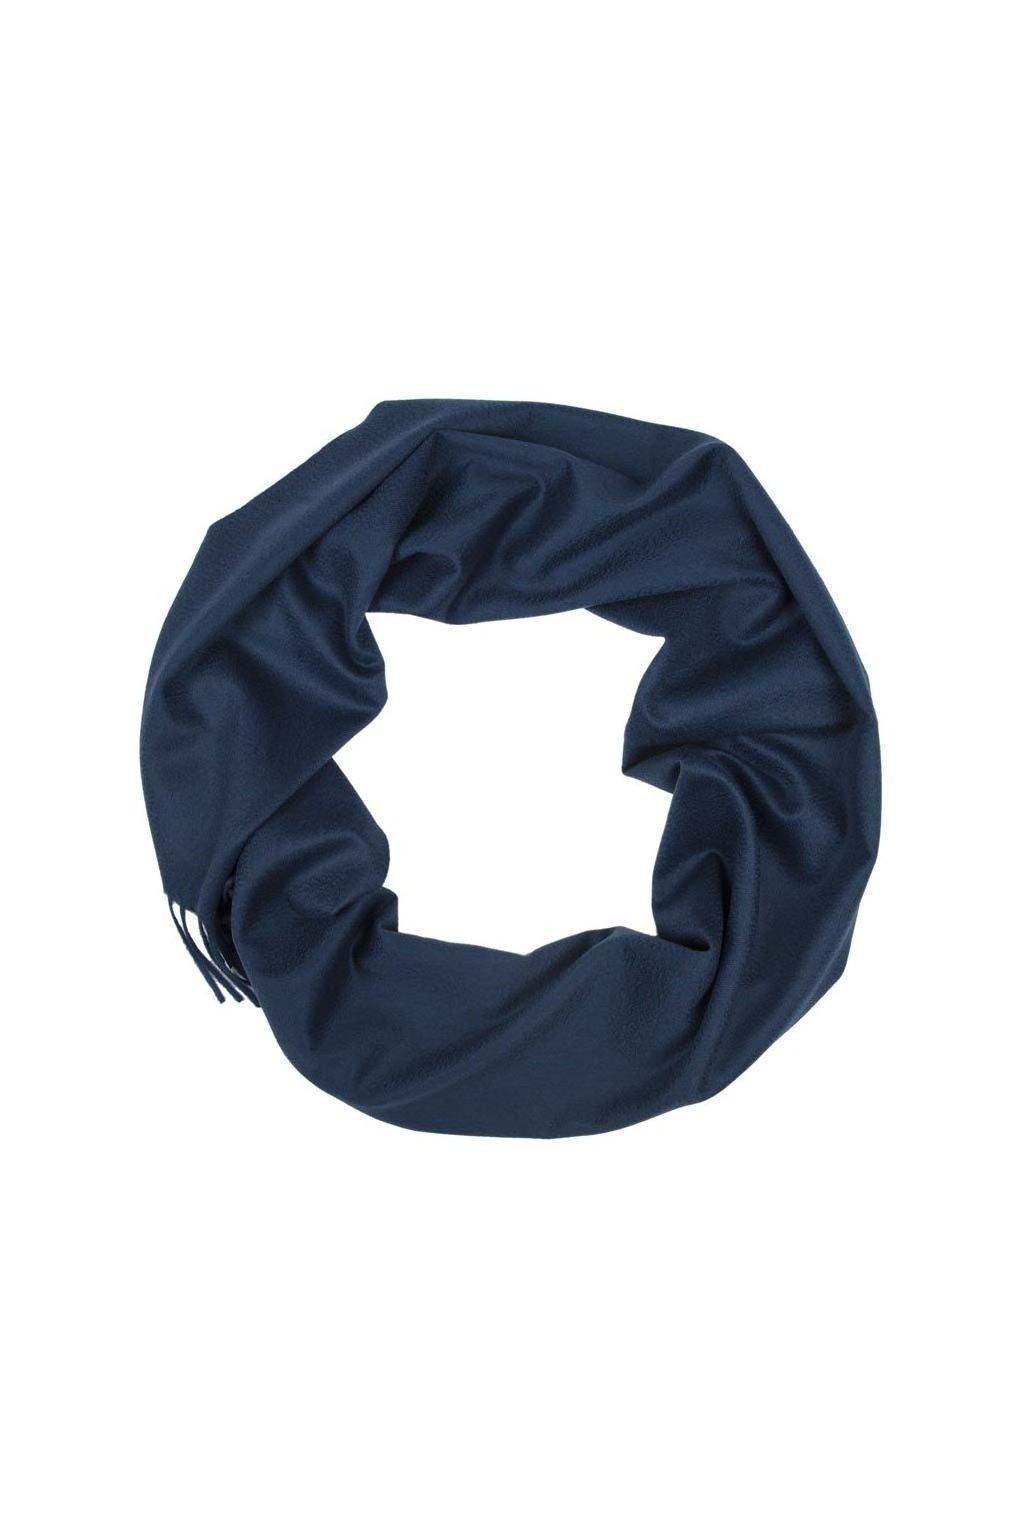 IT1087553 Cashmere slate blue